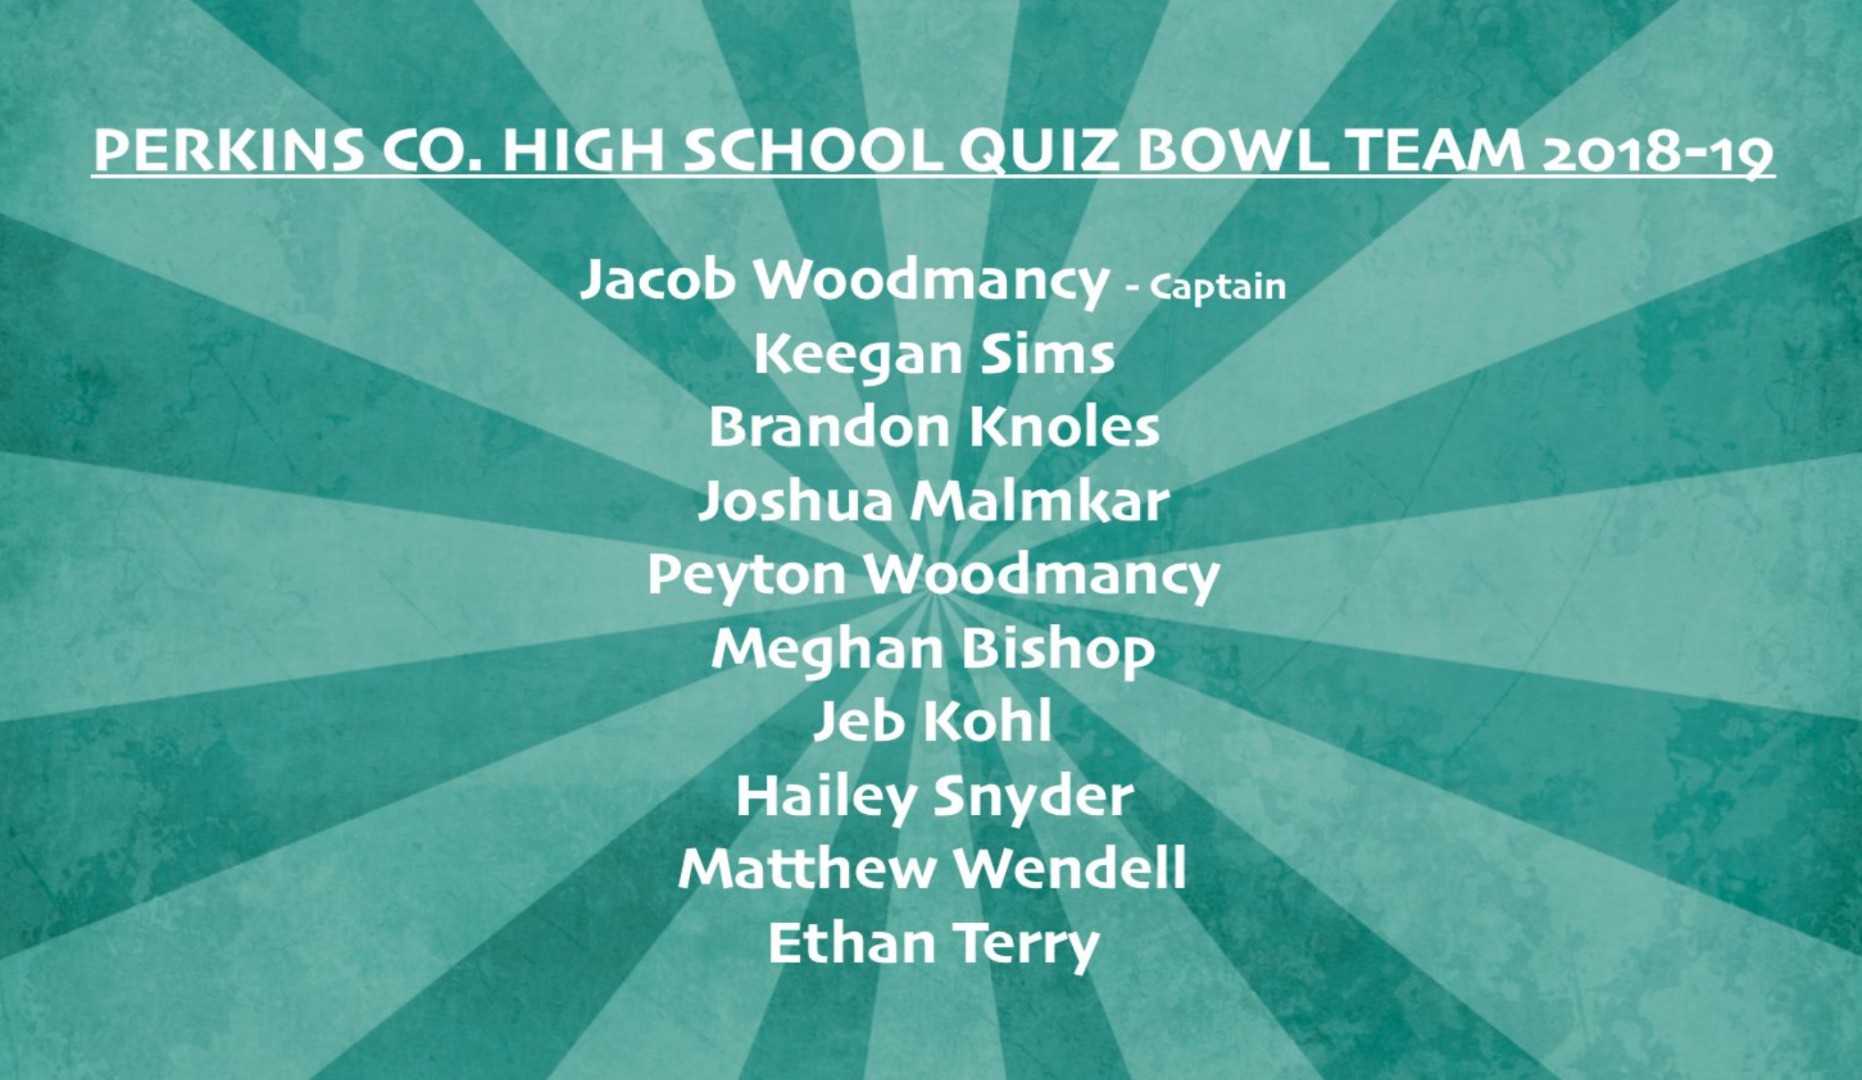 perkins county schools high school quiz bowl team announced for